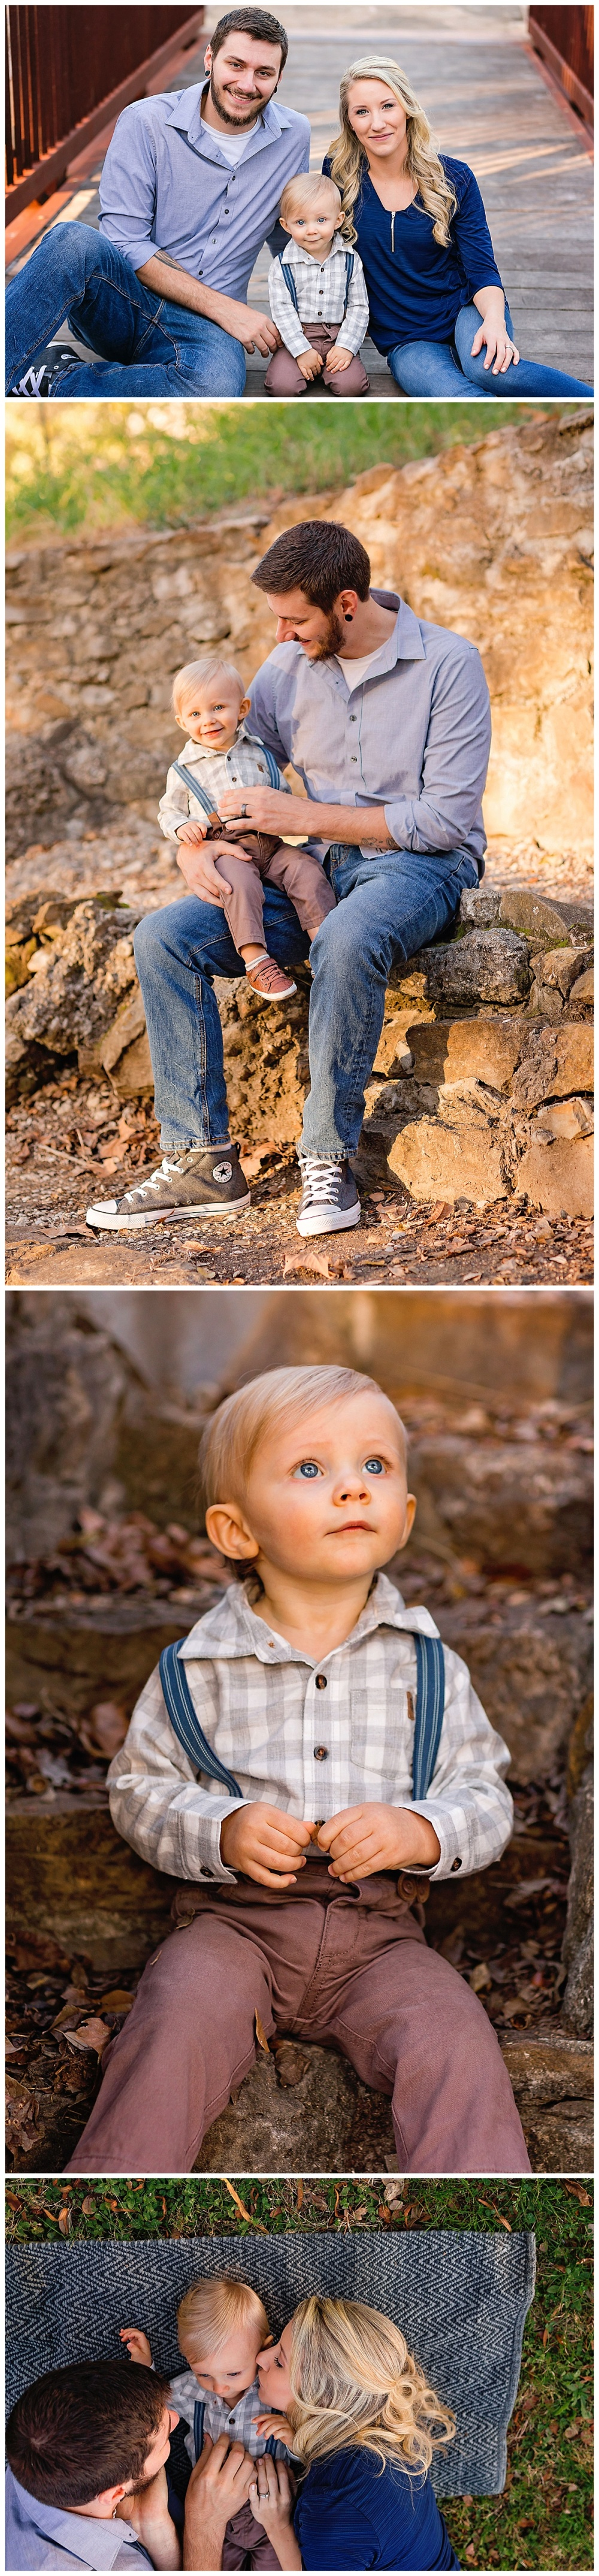 Carly-Barton-Photography-San-Antonio-Texas-Hill-Country-Fall-Heubaum_0122